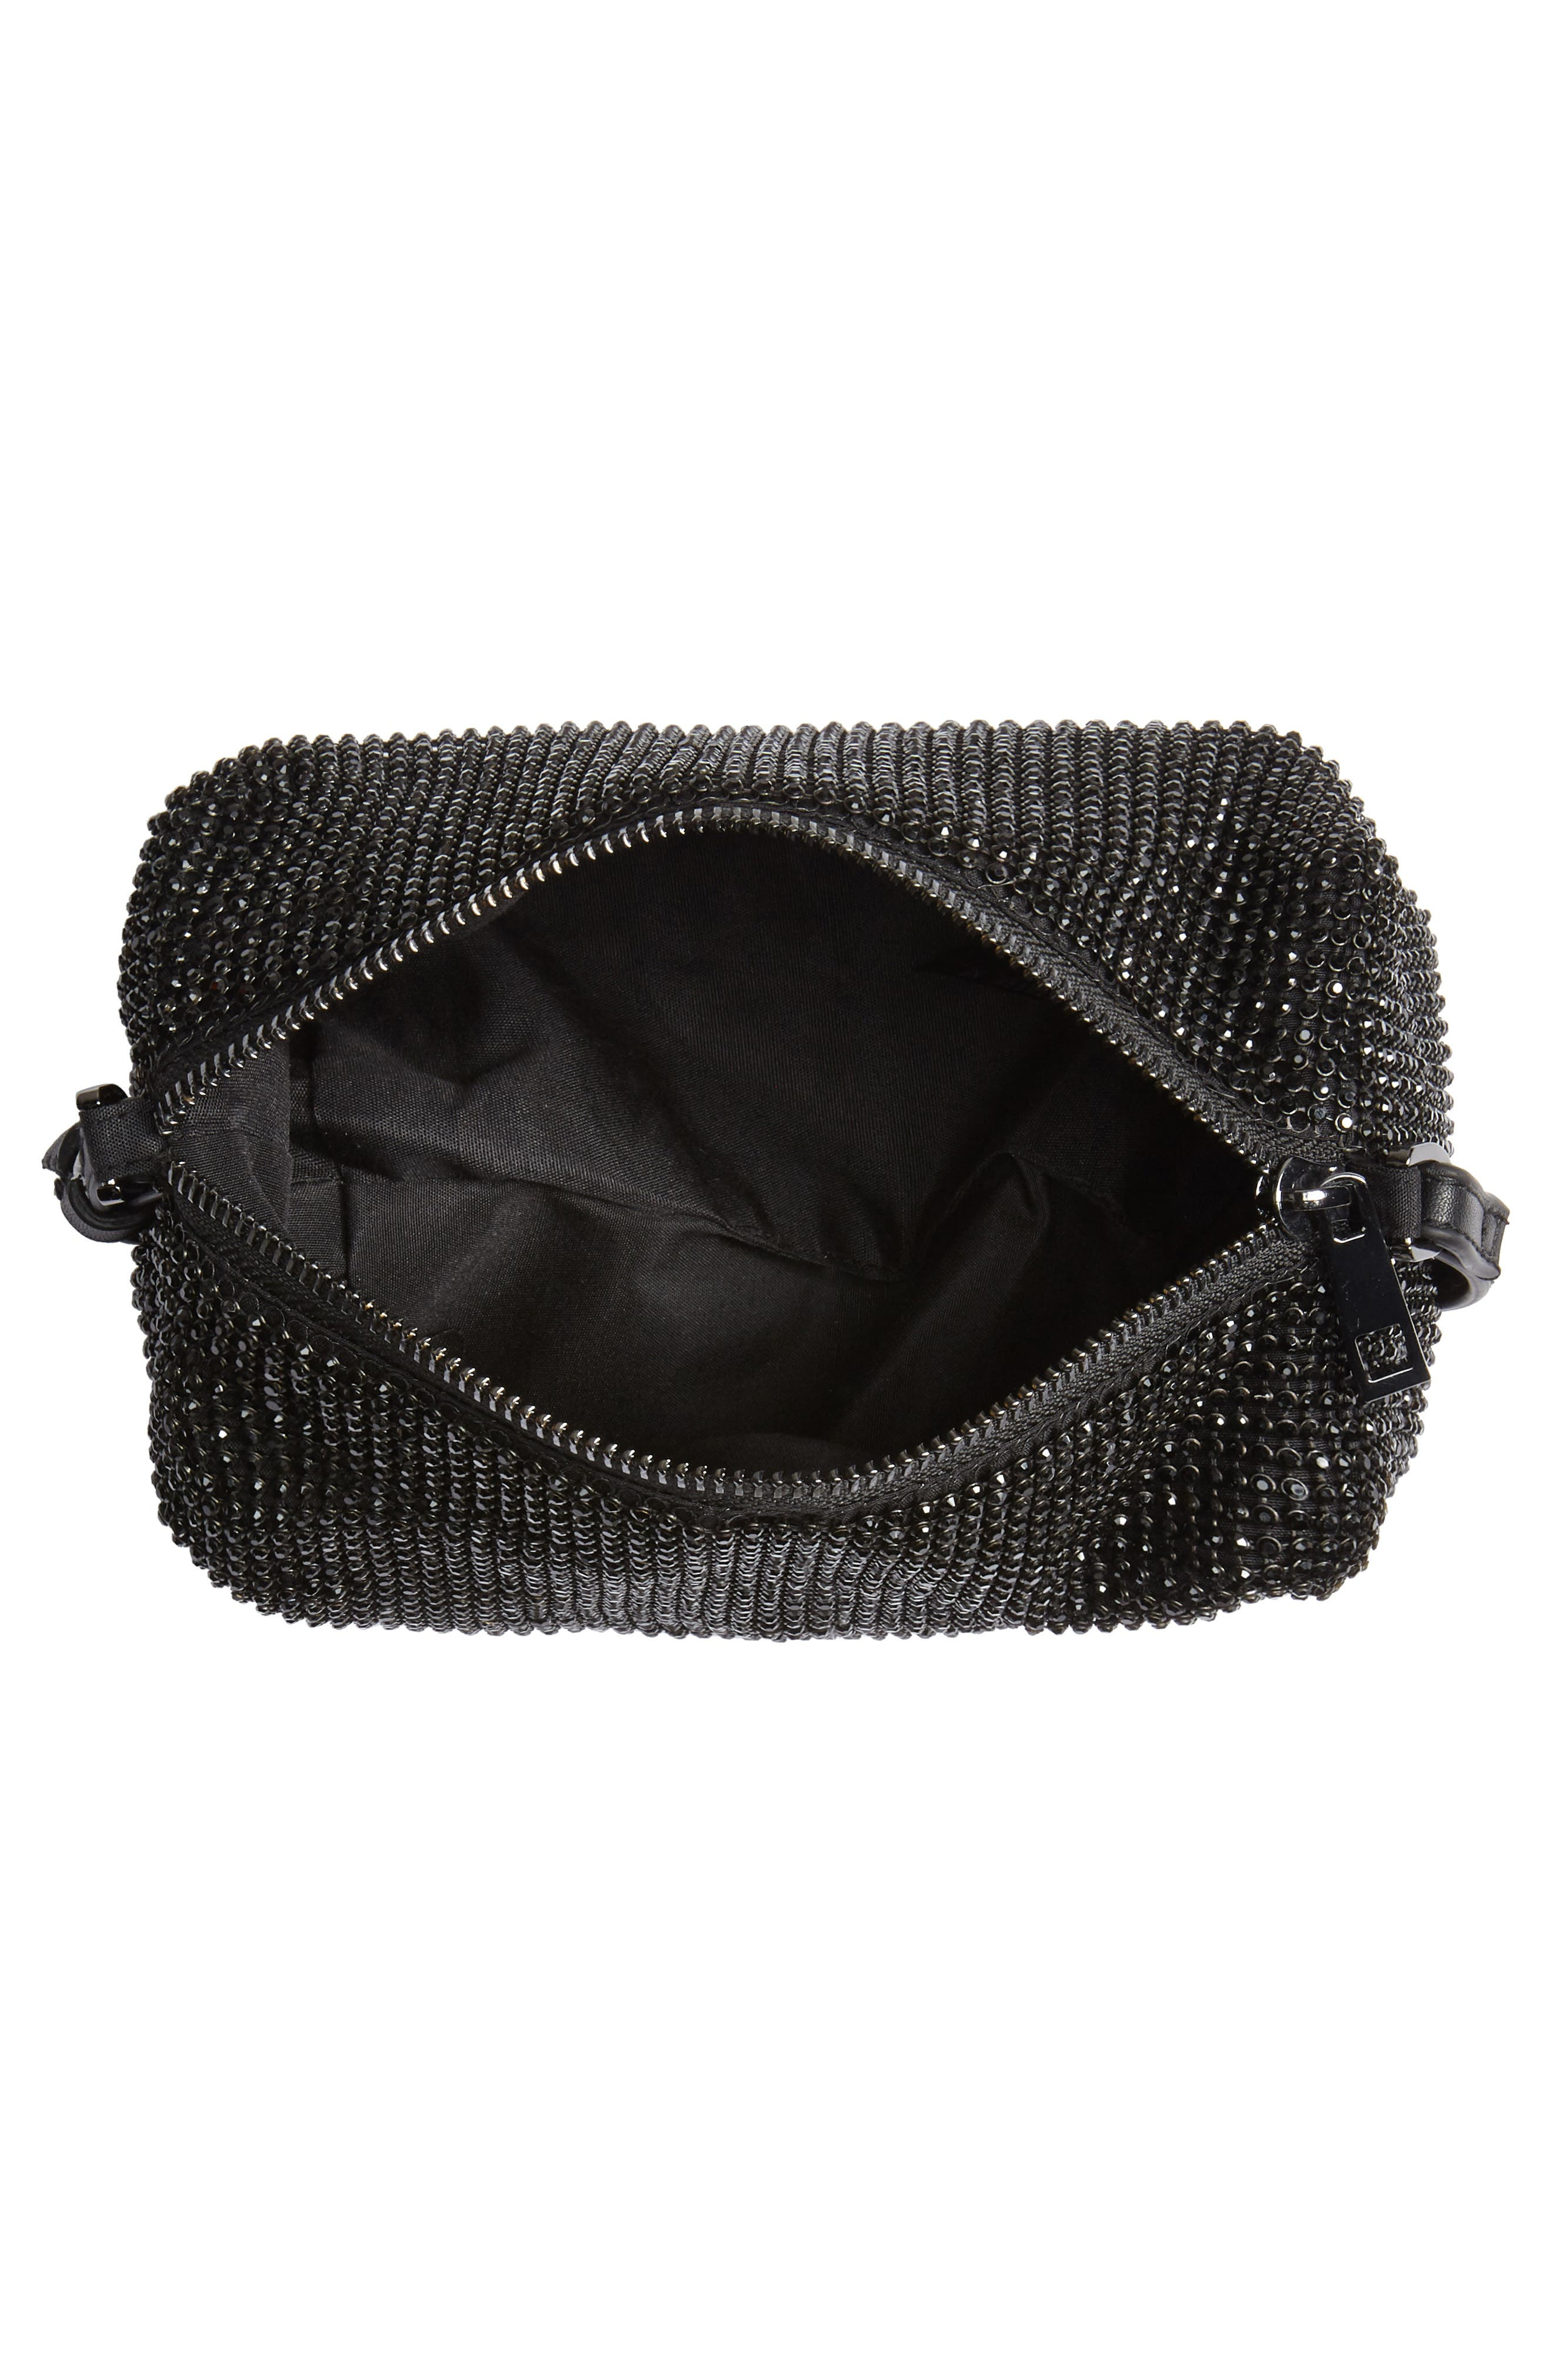 Chia Crystal Embellished Crossbody Bag,                             Alternate thumbnail 4, color,                             BLACK